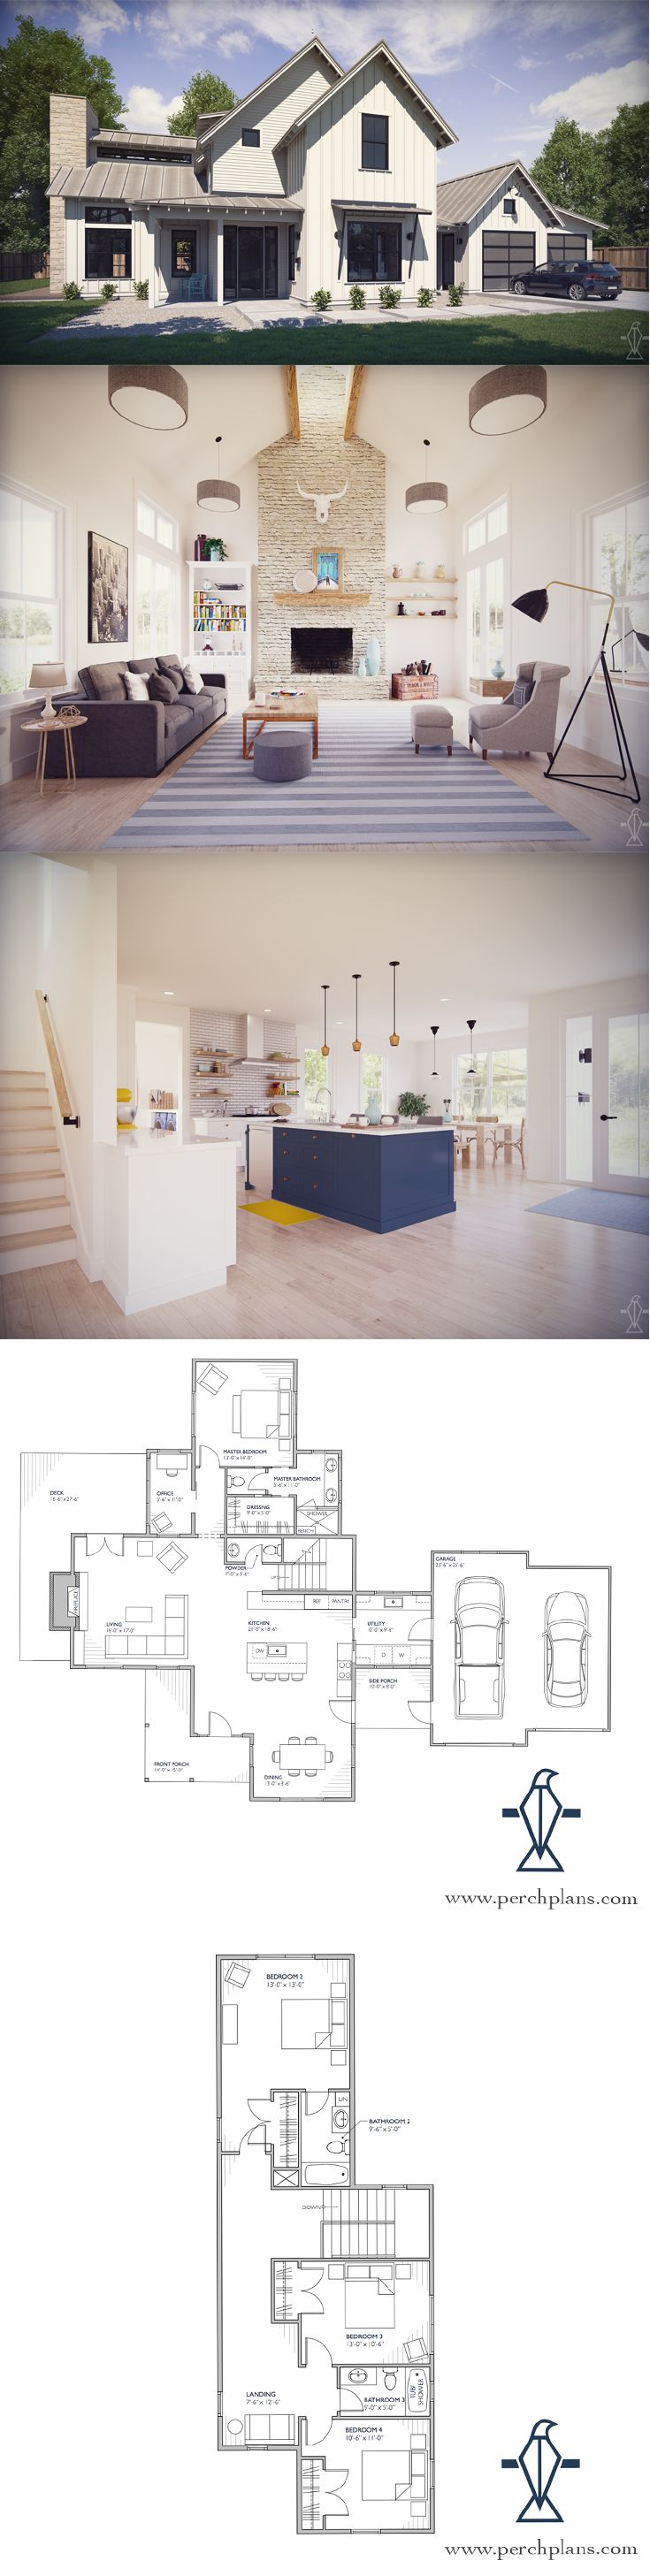 modern farmhouse floor plans. Our Normande Modern Farmhouse Floor Plan Is Perfect For Families With Its Open Concept Living Space Plans